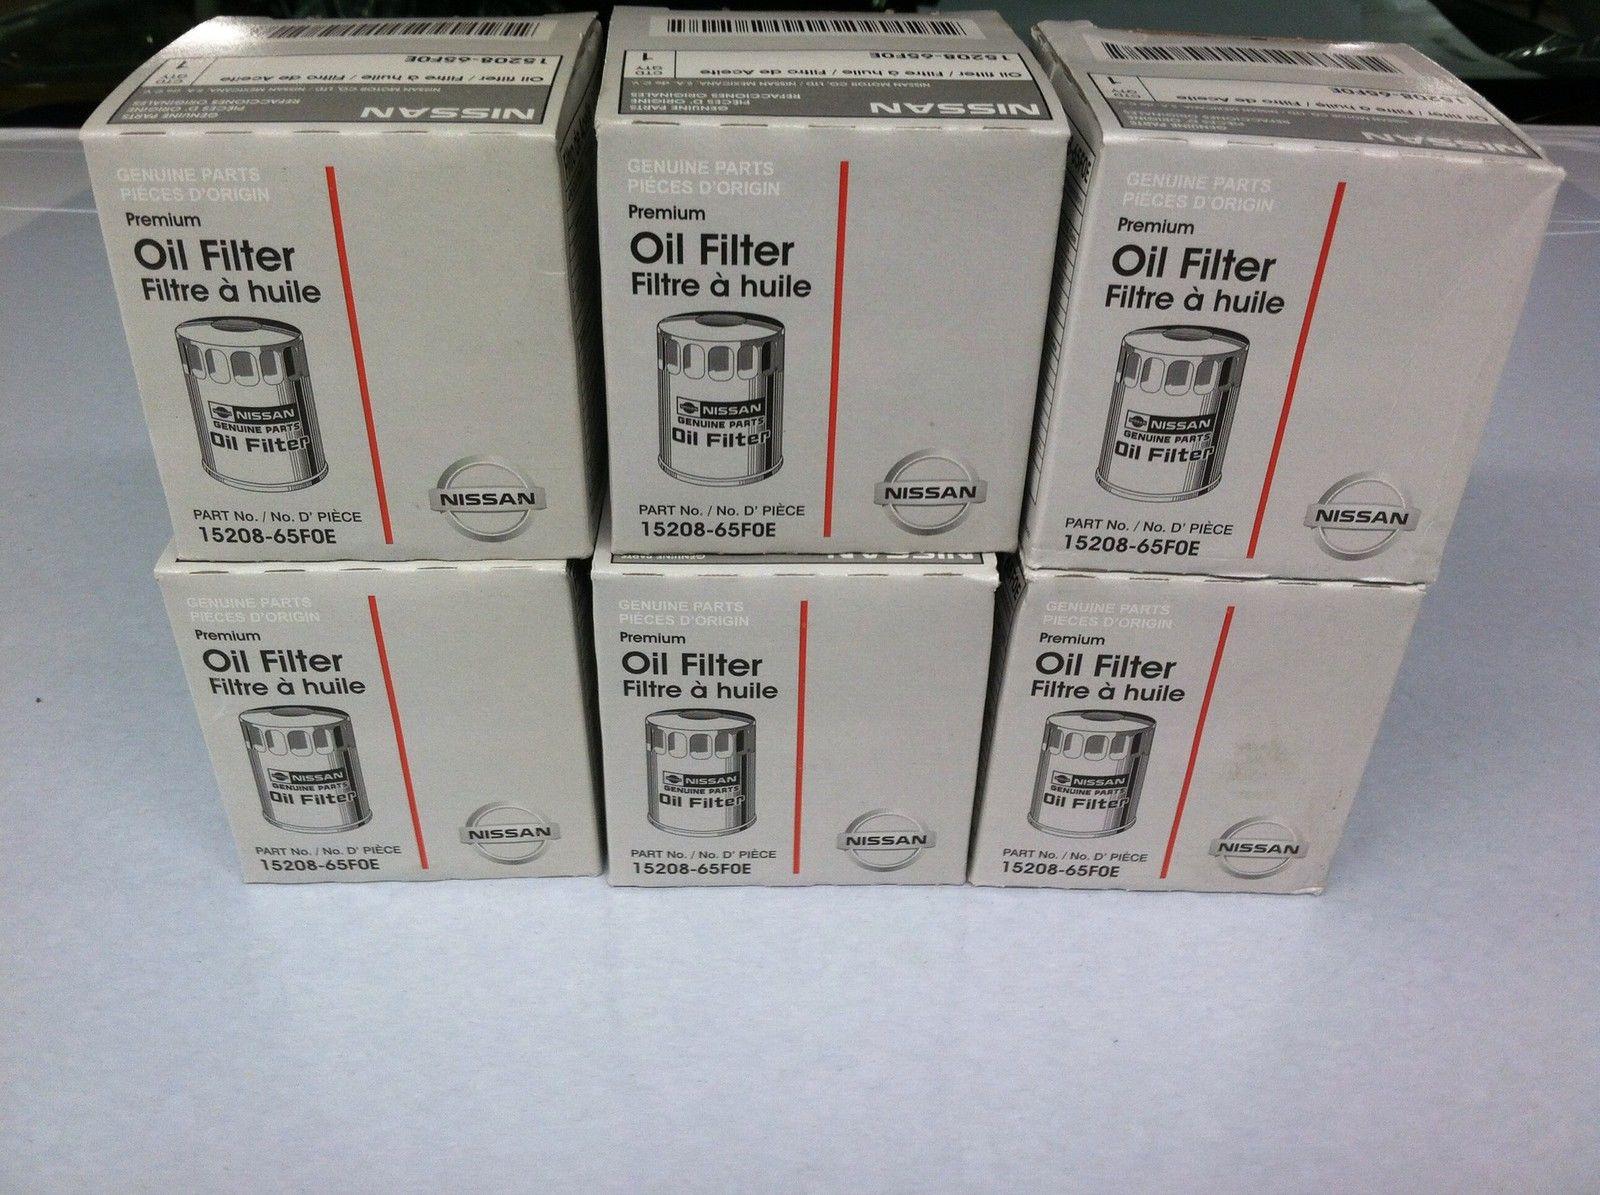 Oil Filter - Nissan (15208-65F0E) SIX PACK - Nissan (OILFILTERSIXPACK)